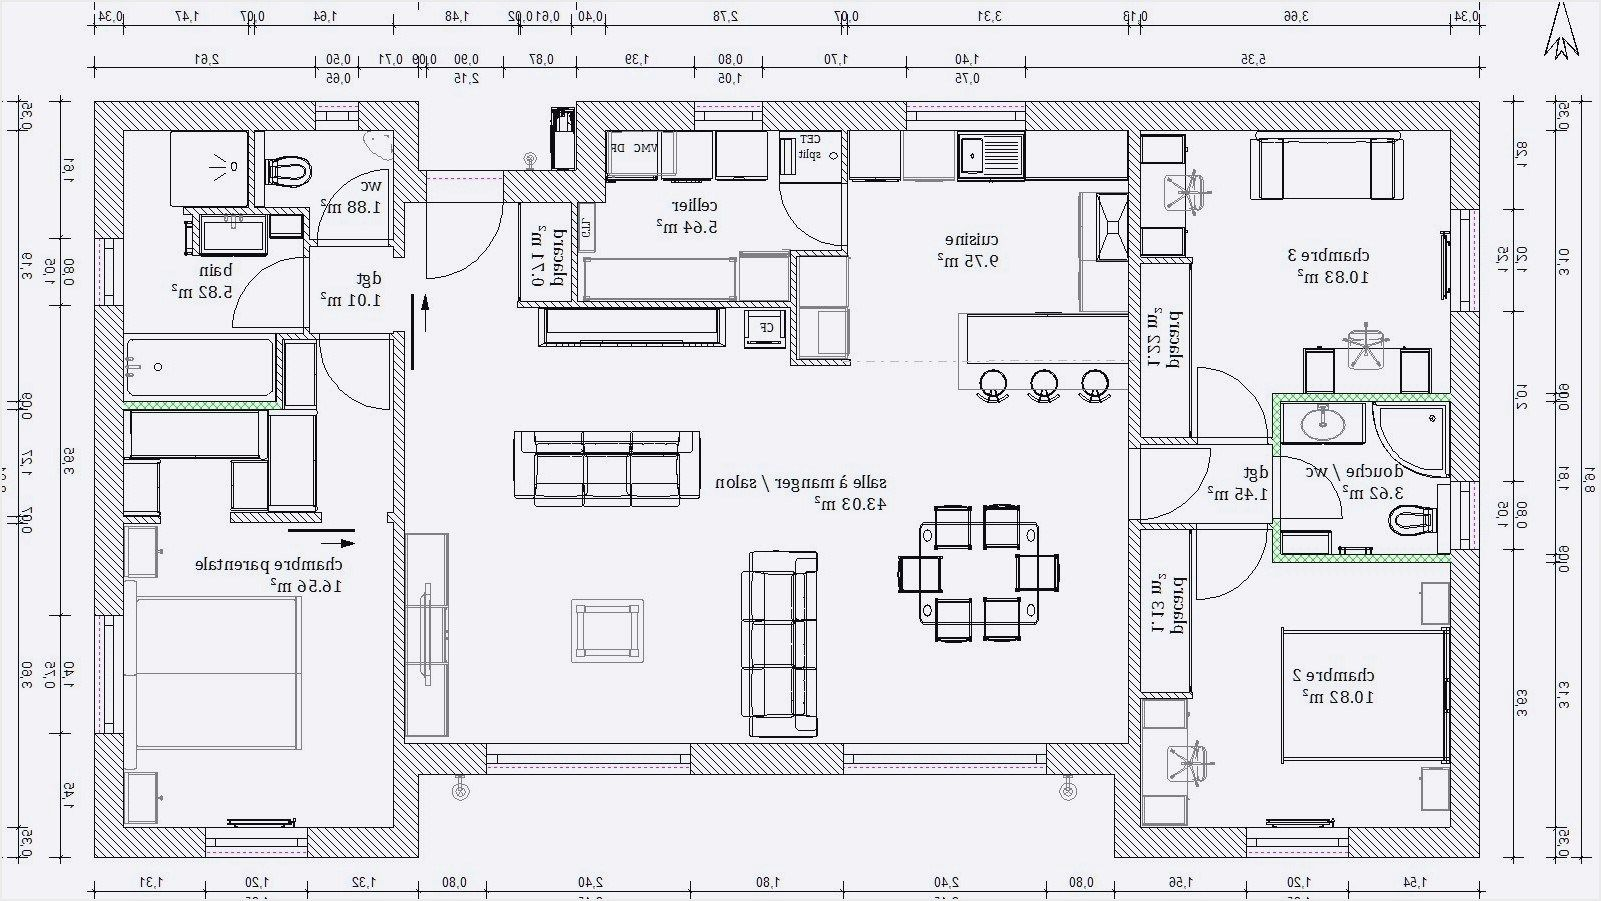 Epingle Par Marianederimatara Sur Plan Maison Plan Maison Plain Pied Maison Plain Pied Plan Maison 120m2